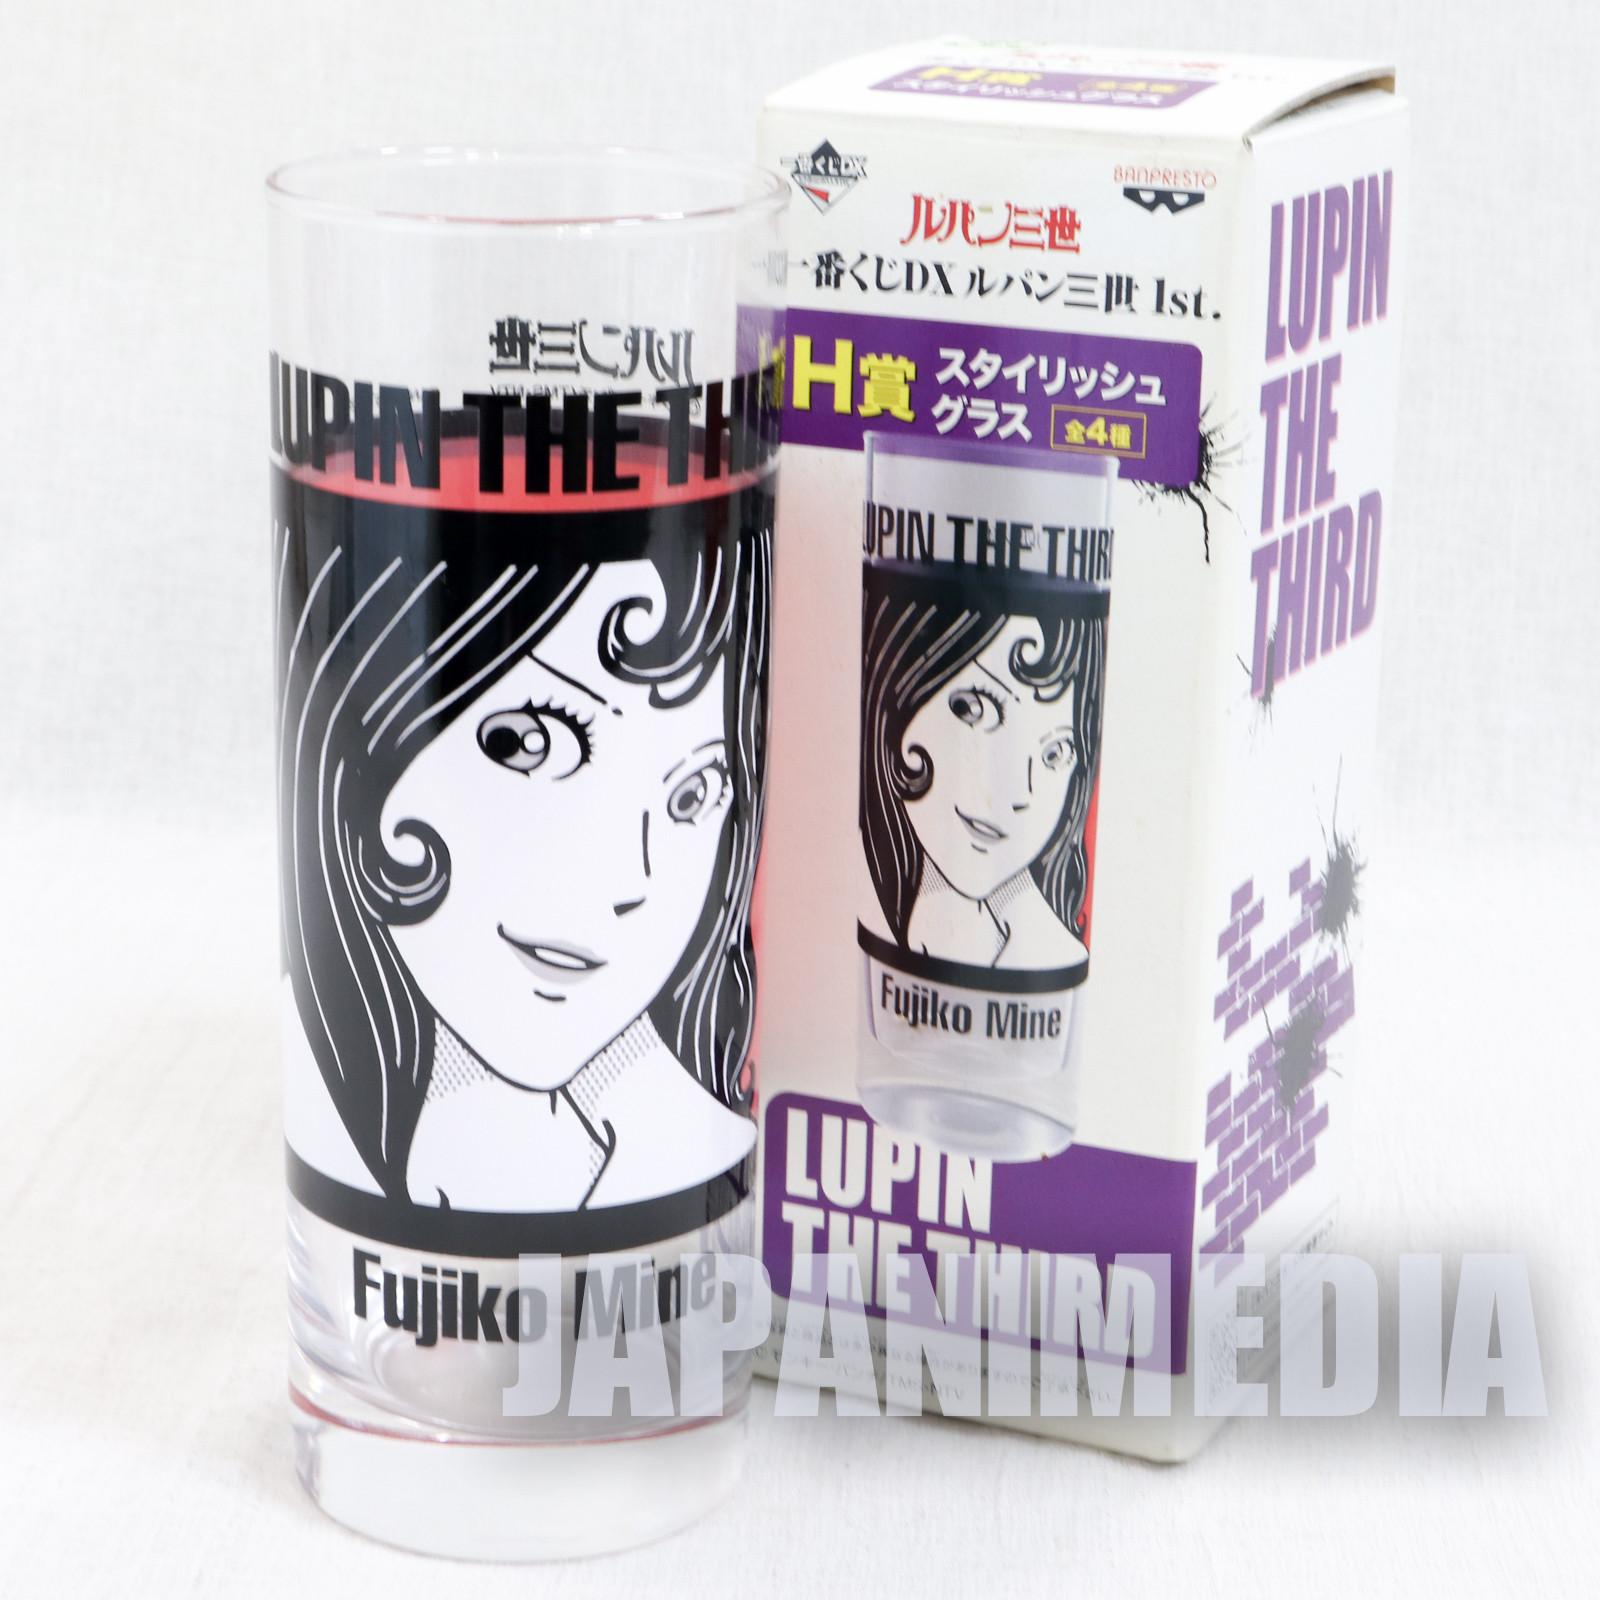 Lupin the Third (3rd) Stylish Glass Fujiko Mine Ver. Banpresto JAPAN ANIME MANGA